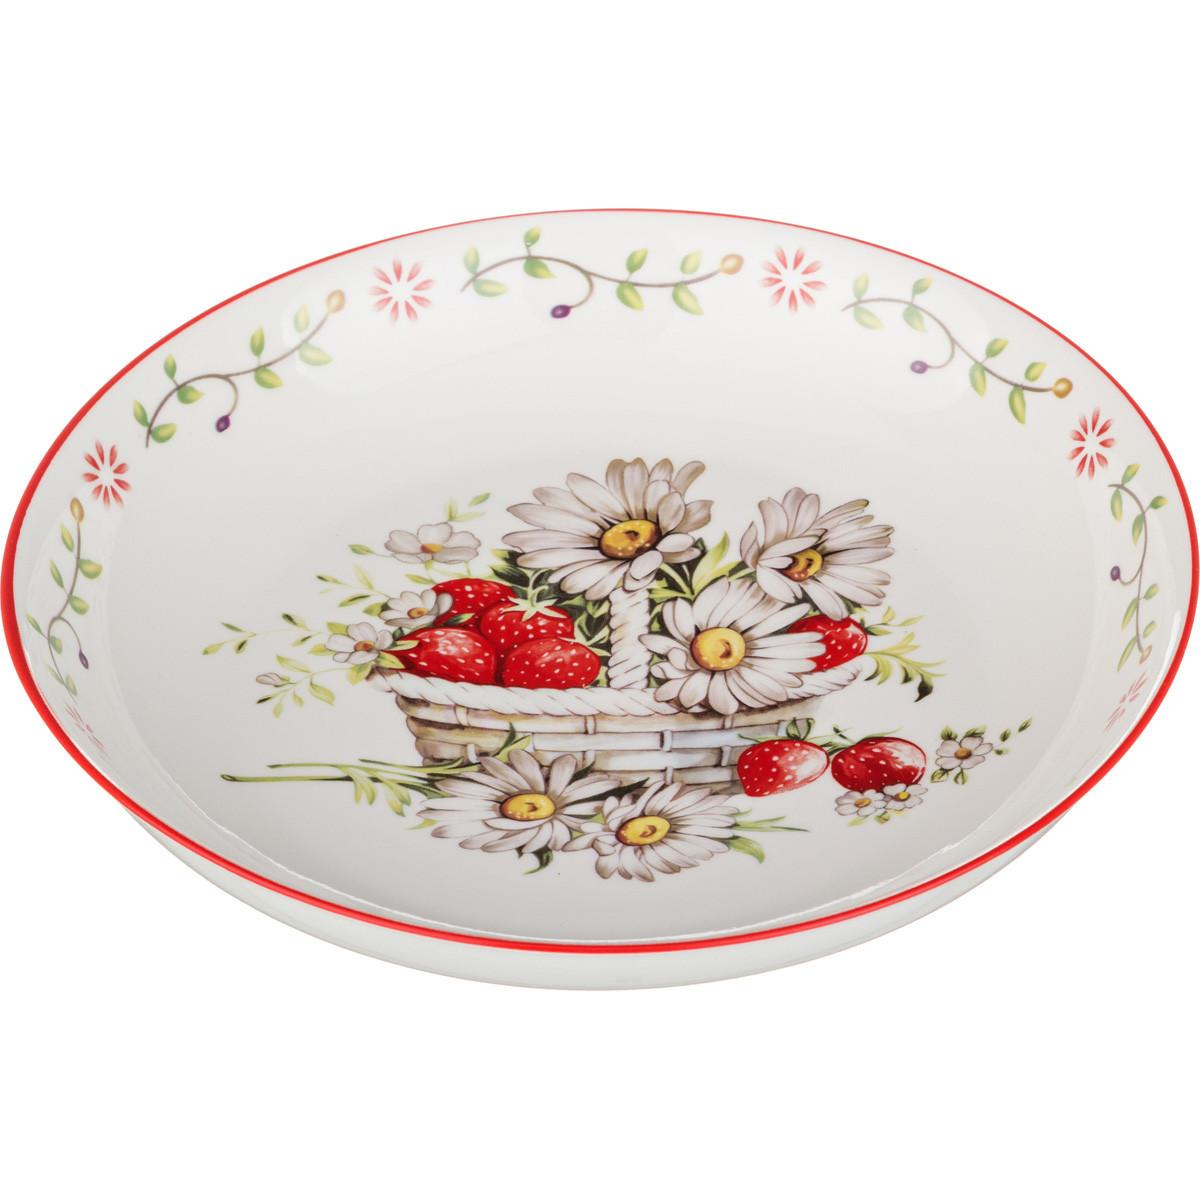 {} Lefard Сервиз Green  (20 см) lefard тарелка millie 20 см